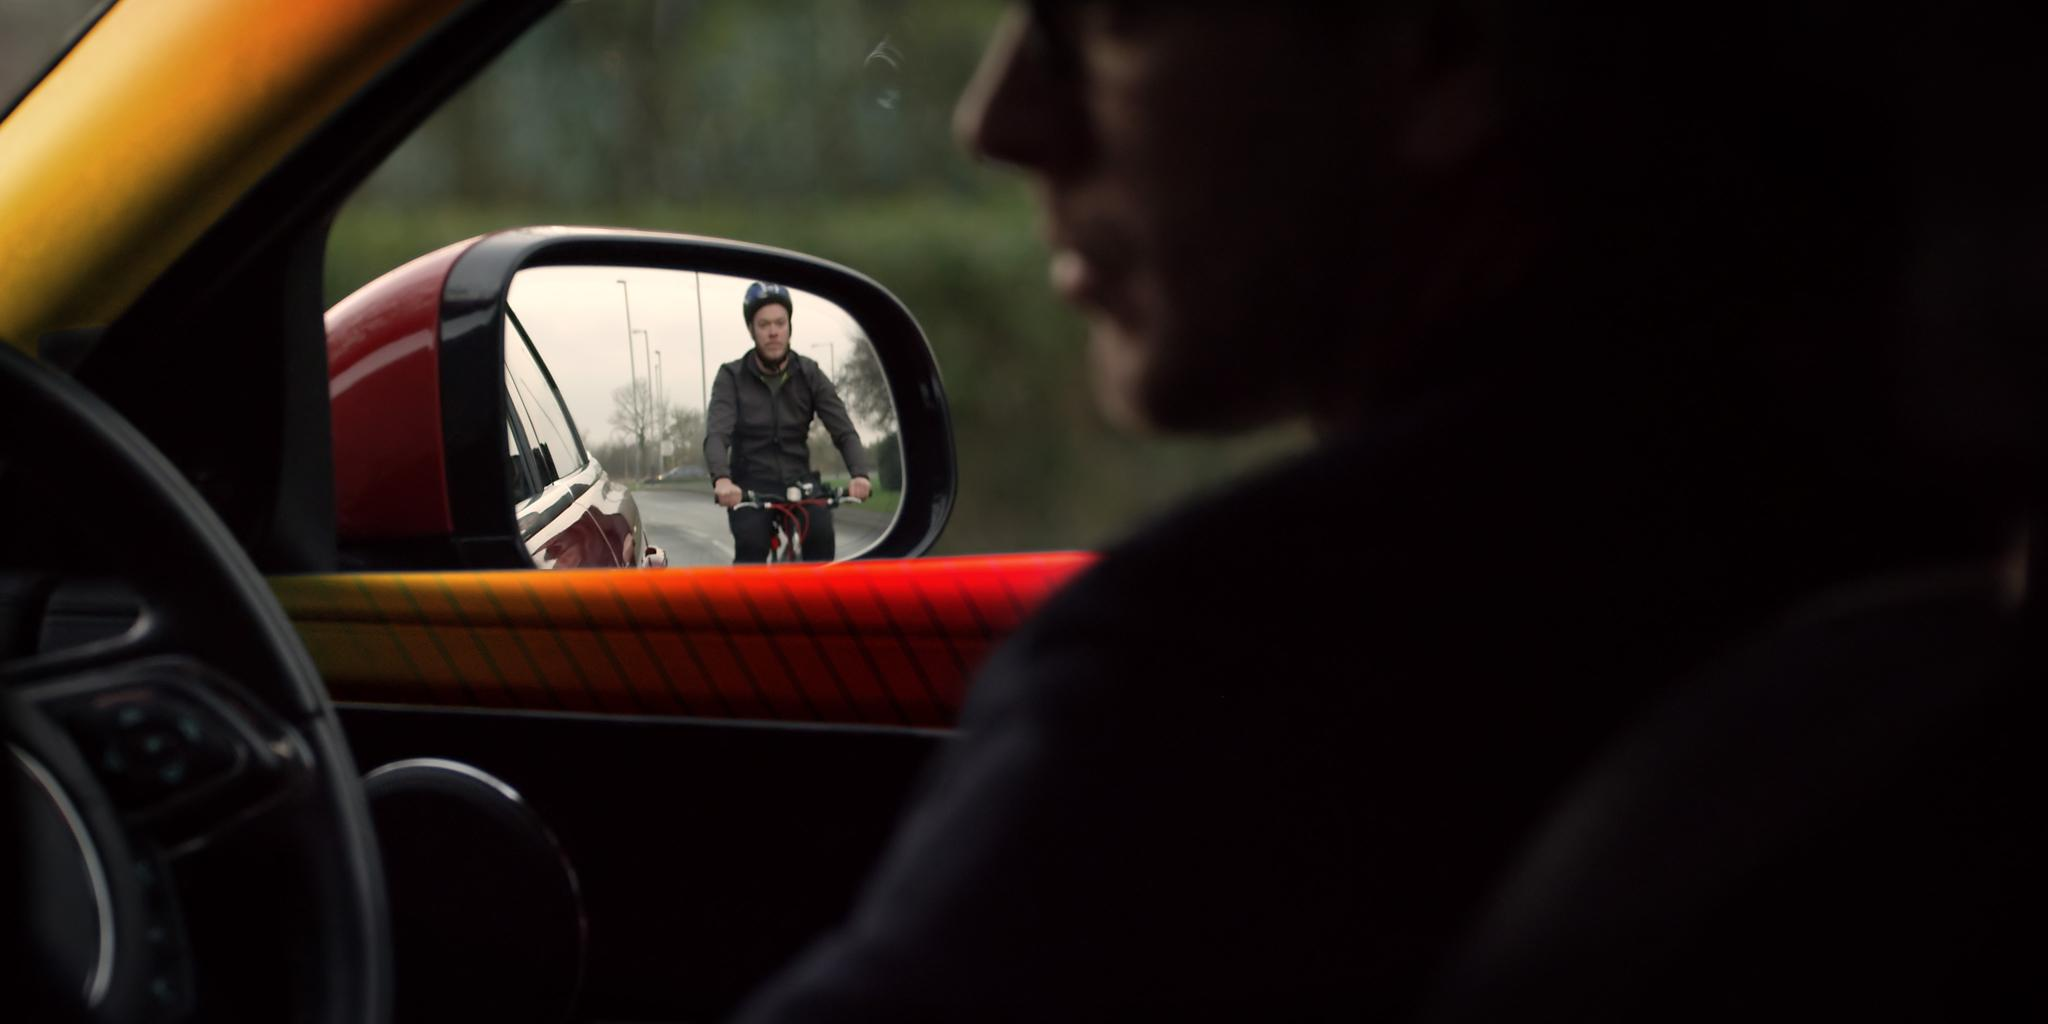 Jaguar-LR Bike Sense, per prevenire gli incidenti